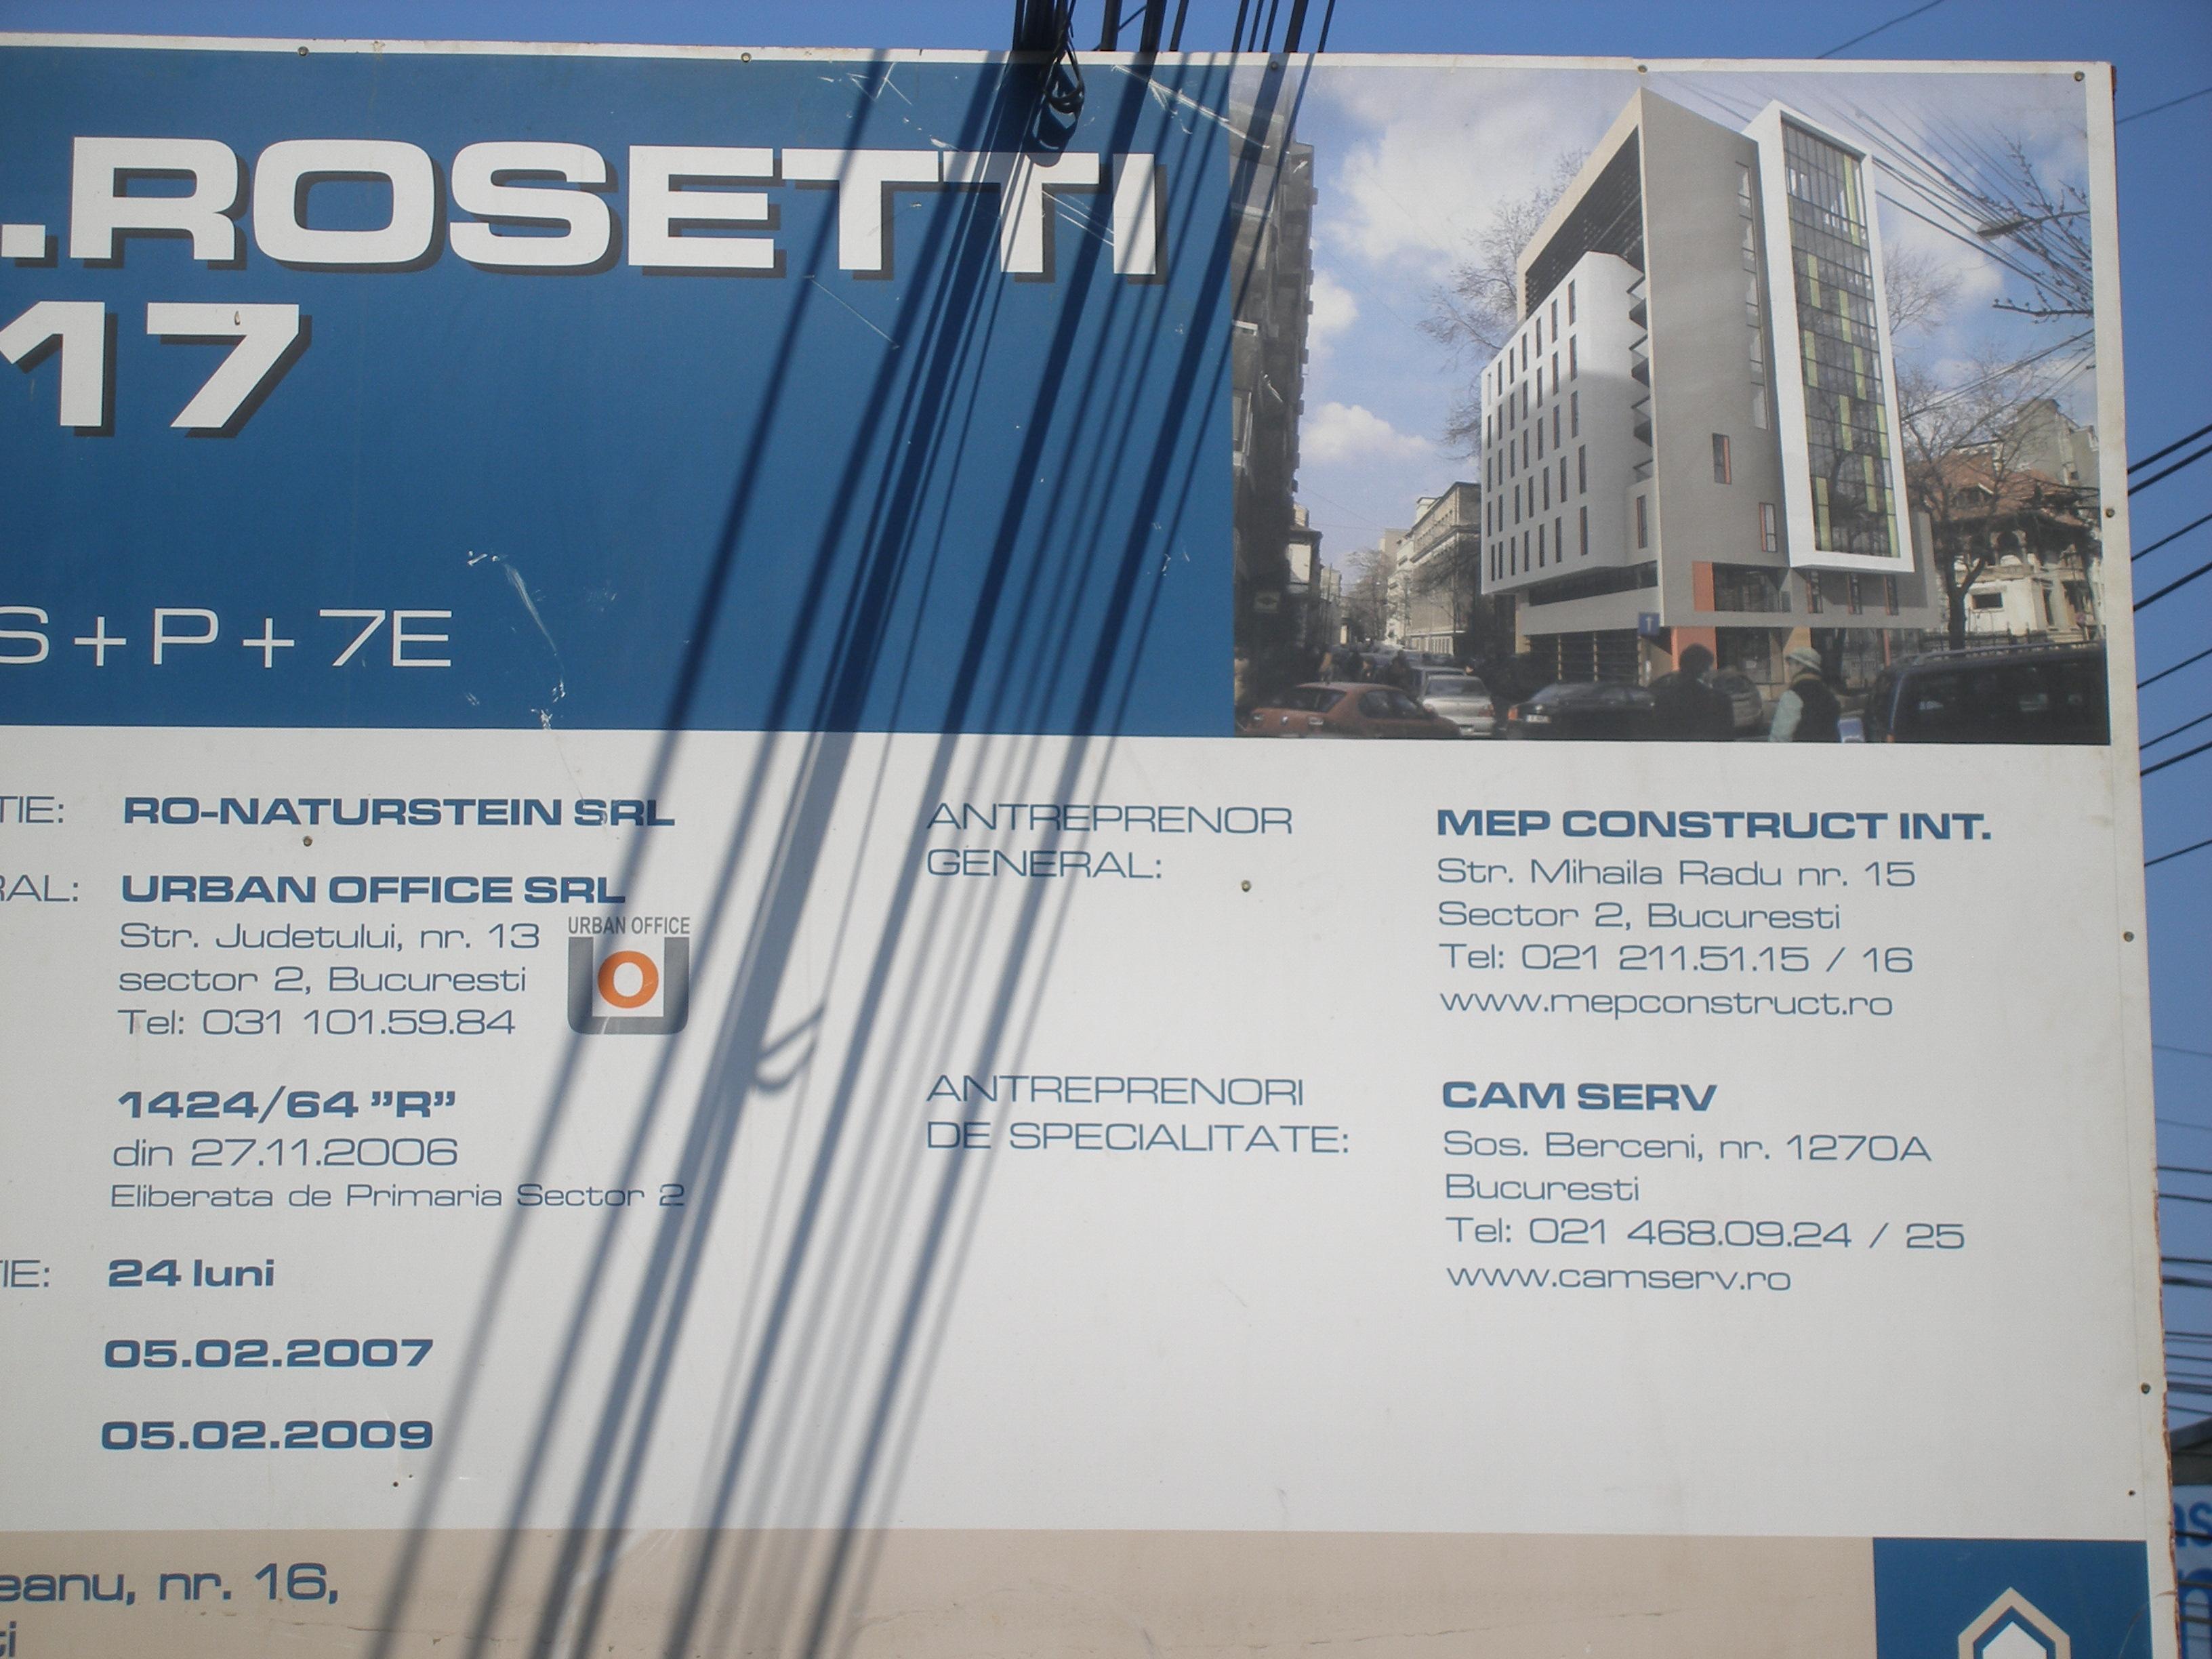 Aditiv in beton - MEP - Imobil birouri - Rosetti 17 - Faza I UNICO PROFIT - Poza 9